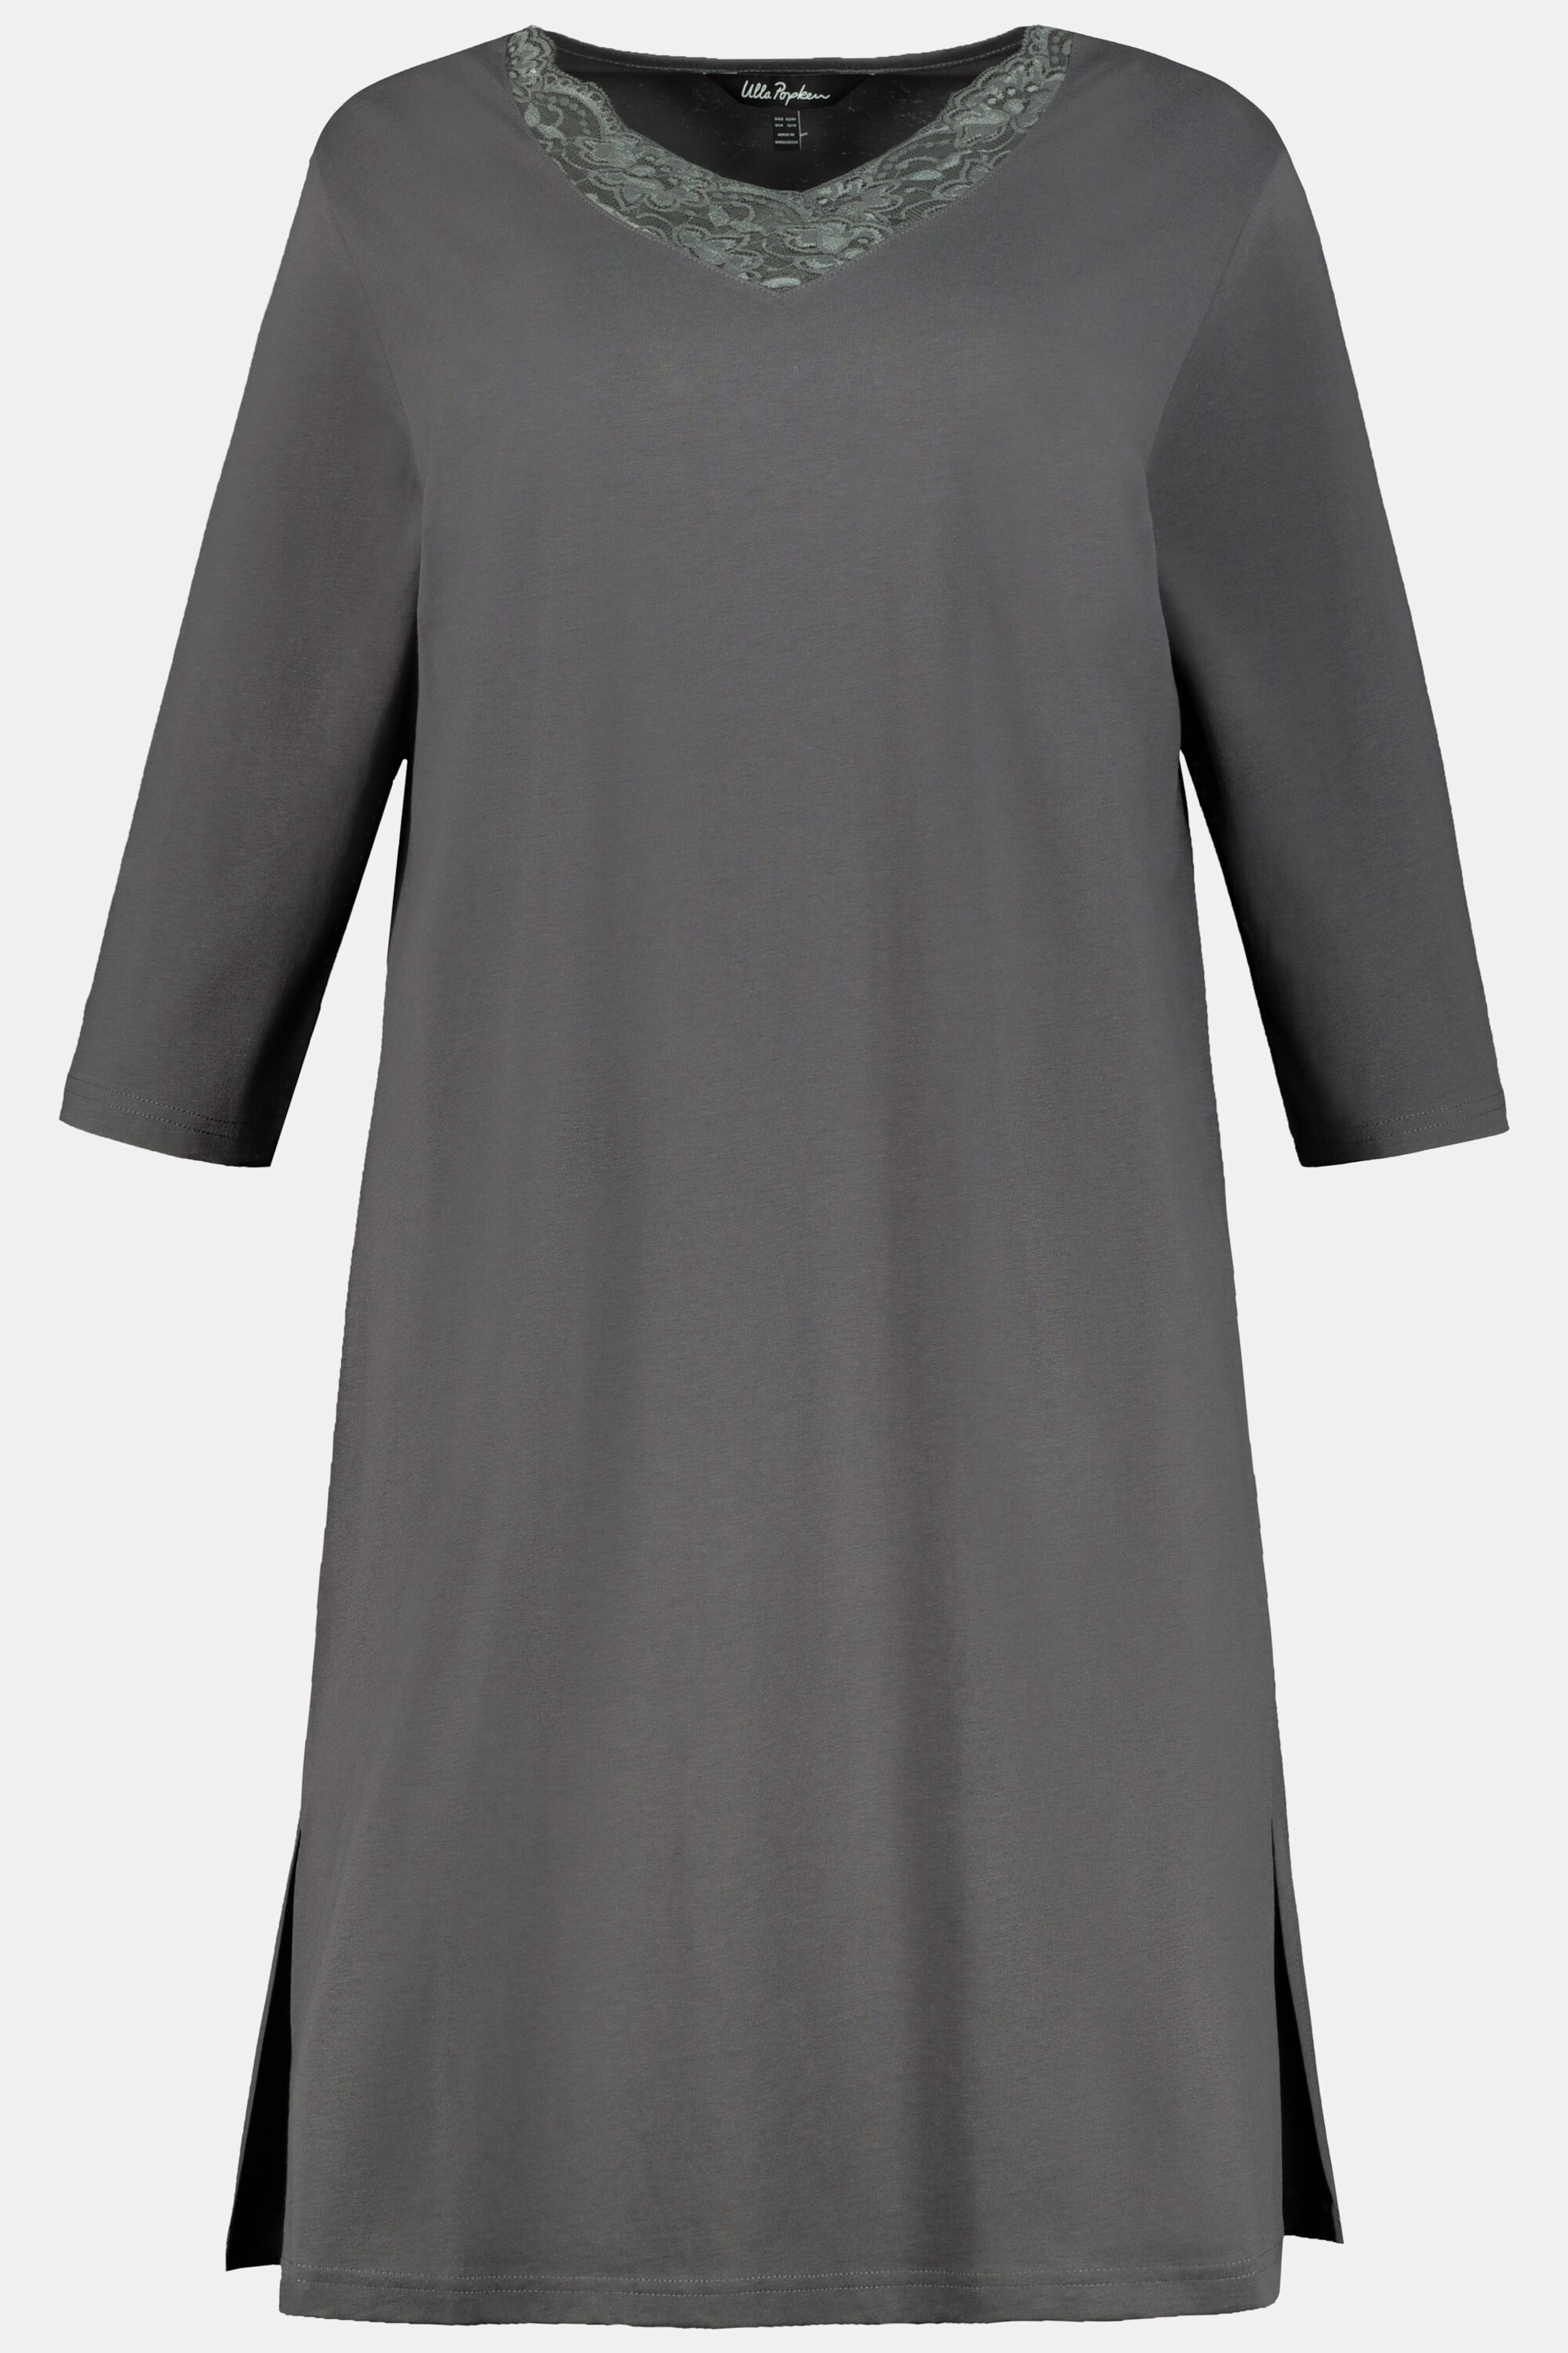 Ulla Popken Nachthemd in anthrazit